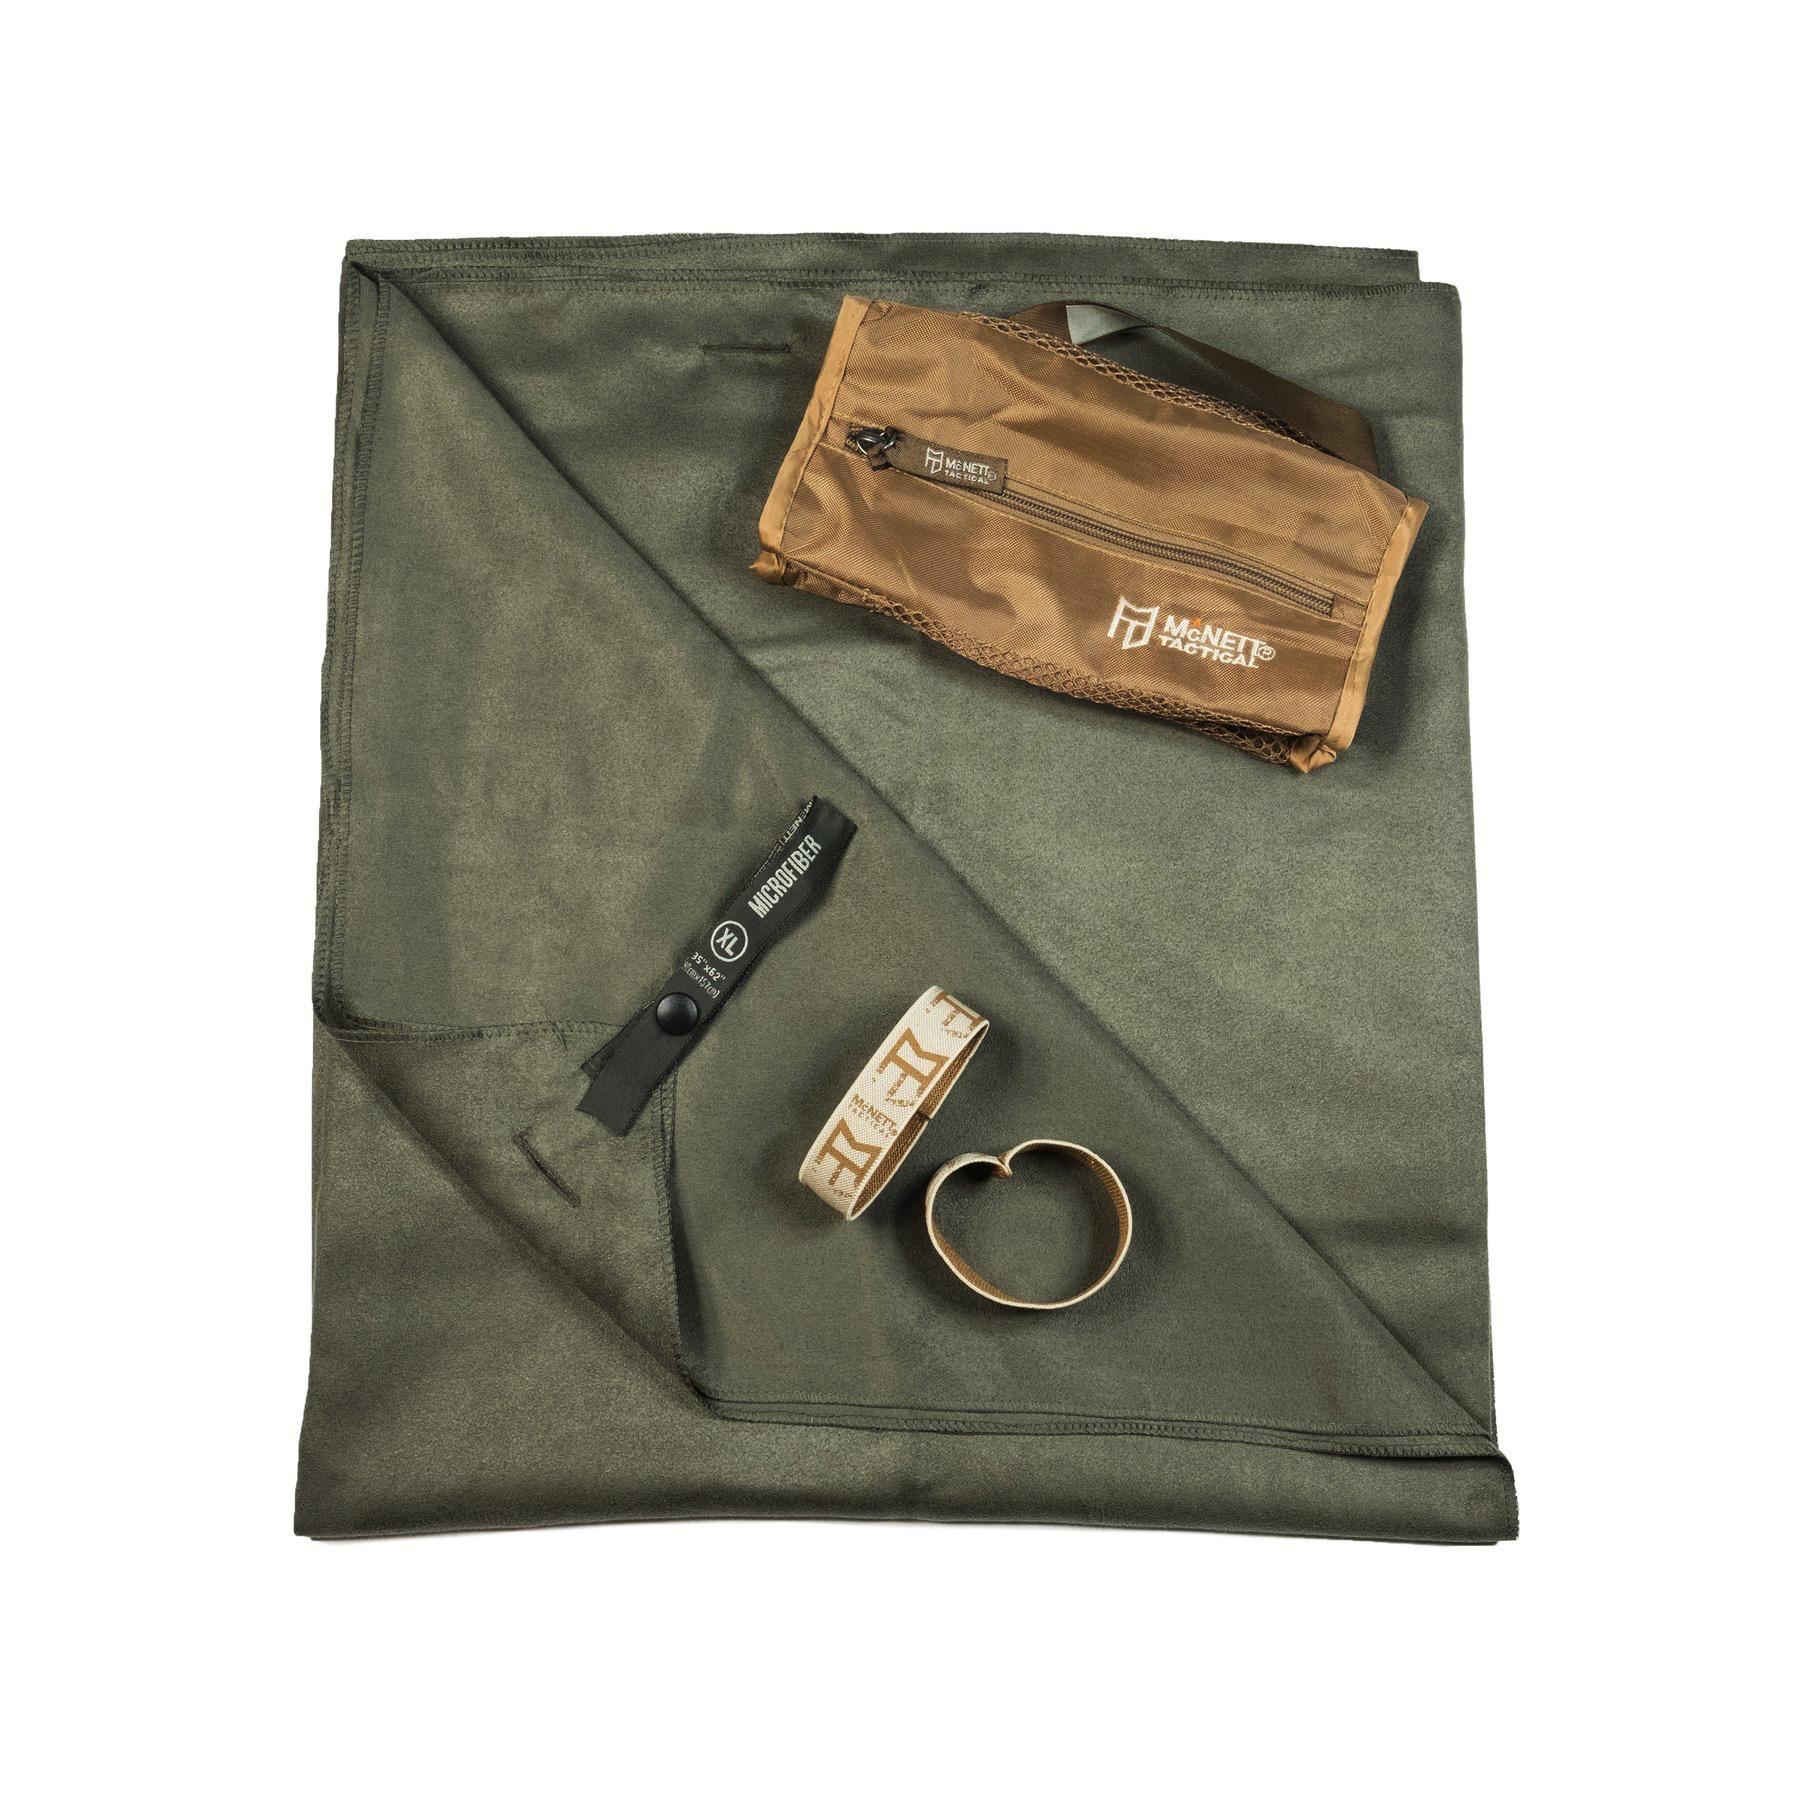 Gear Aid McNett Tactical Ultra Compact Microfiber Towel /& Bag Green X-Large Camp